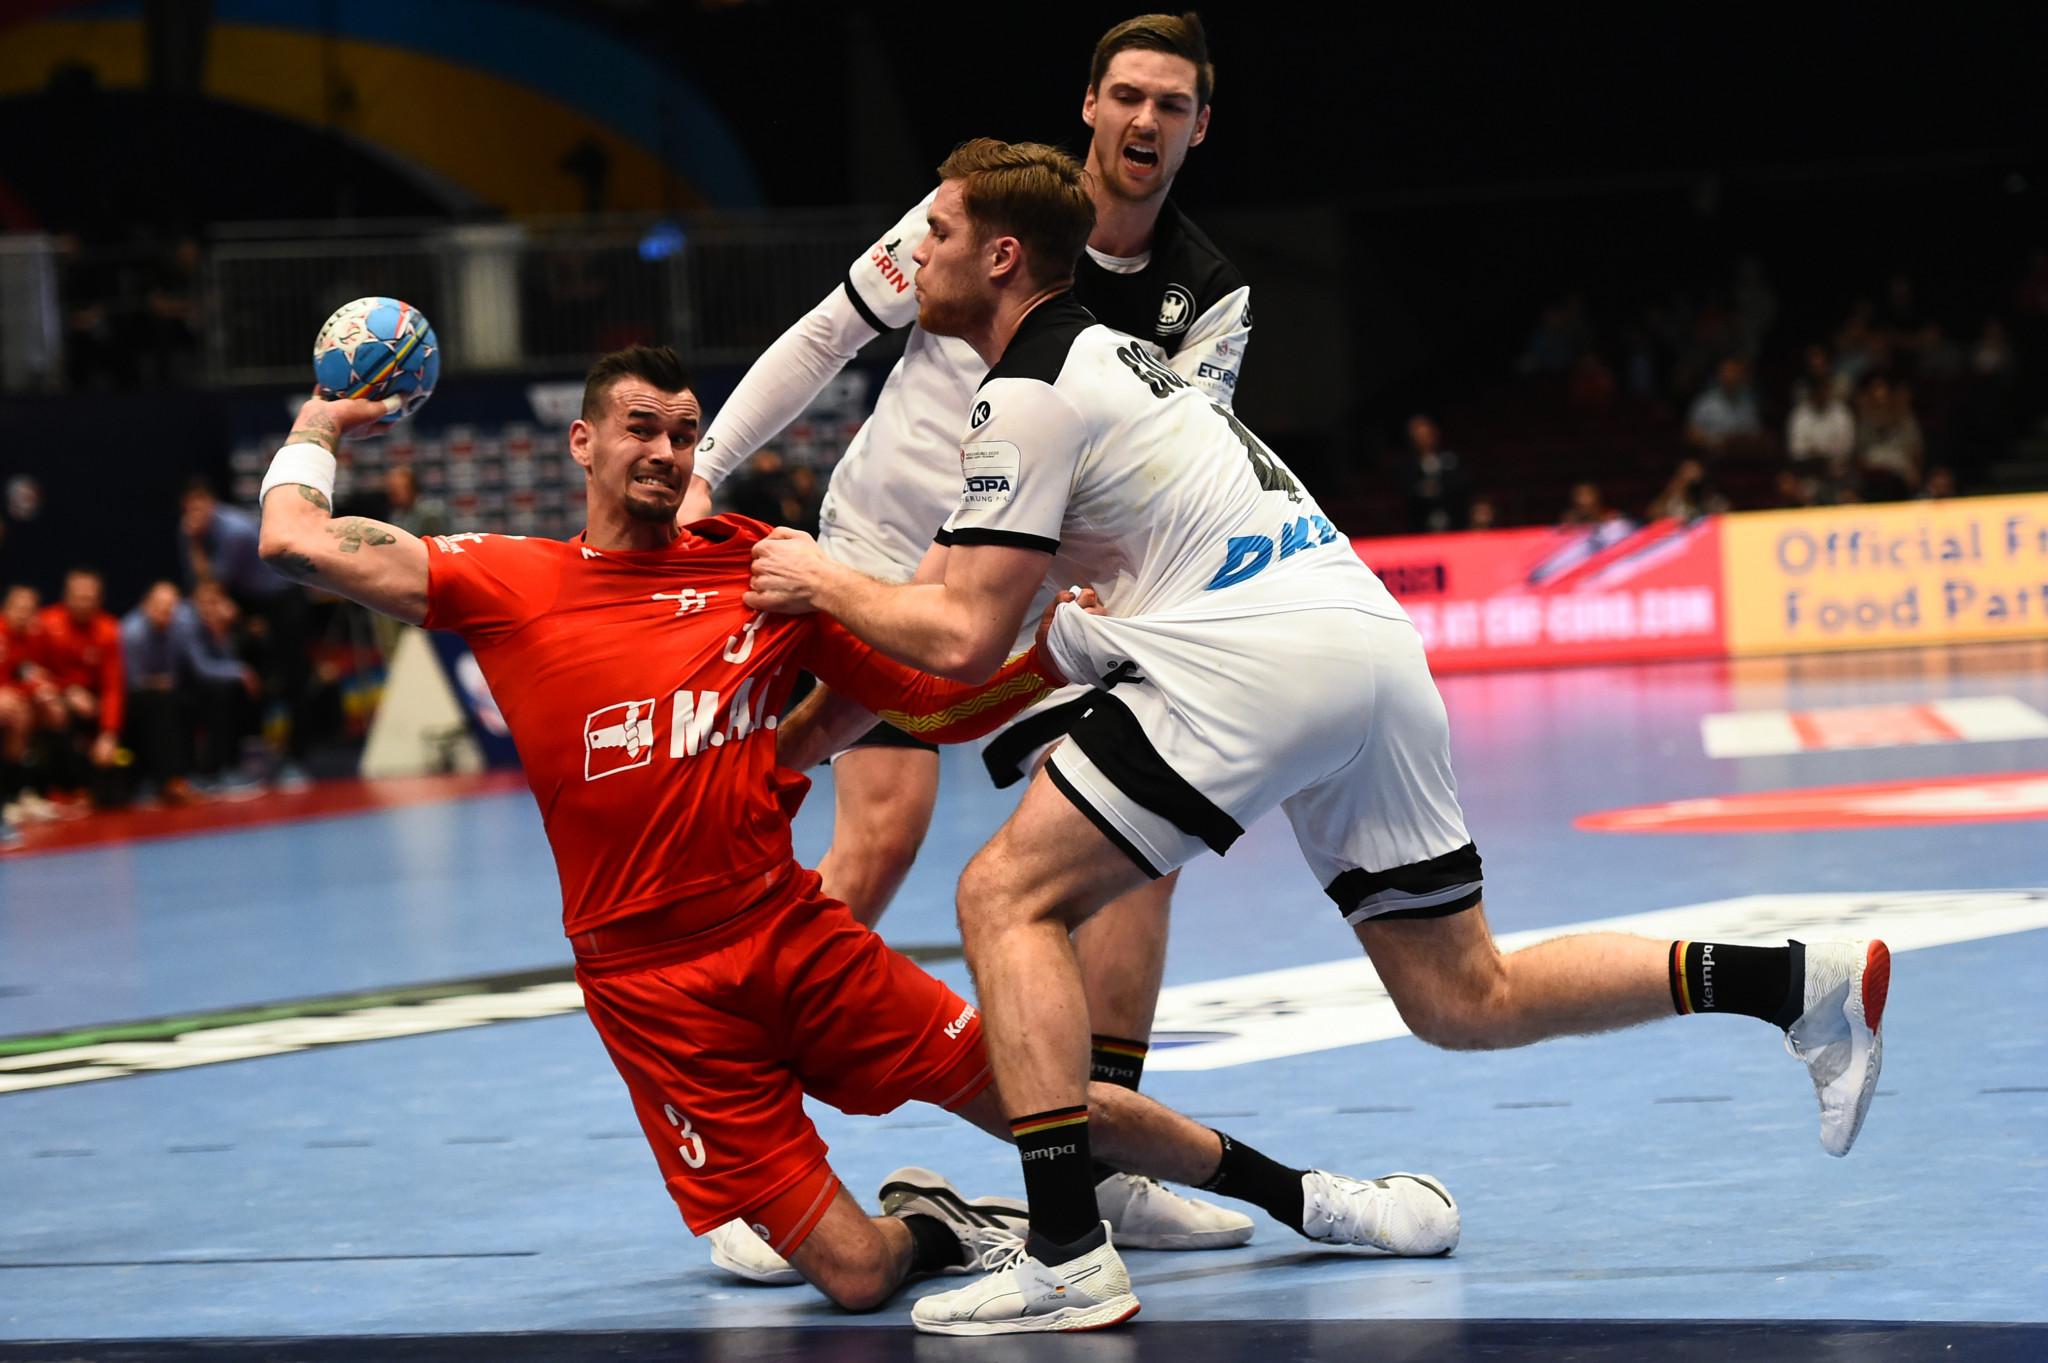 Czech Republic withdraw on eve of Men's World Handball Championship